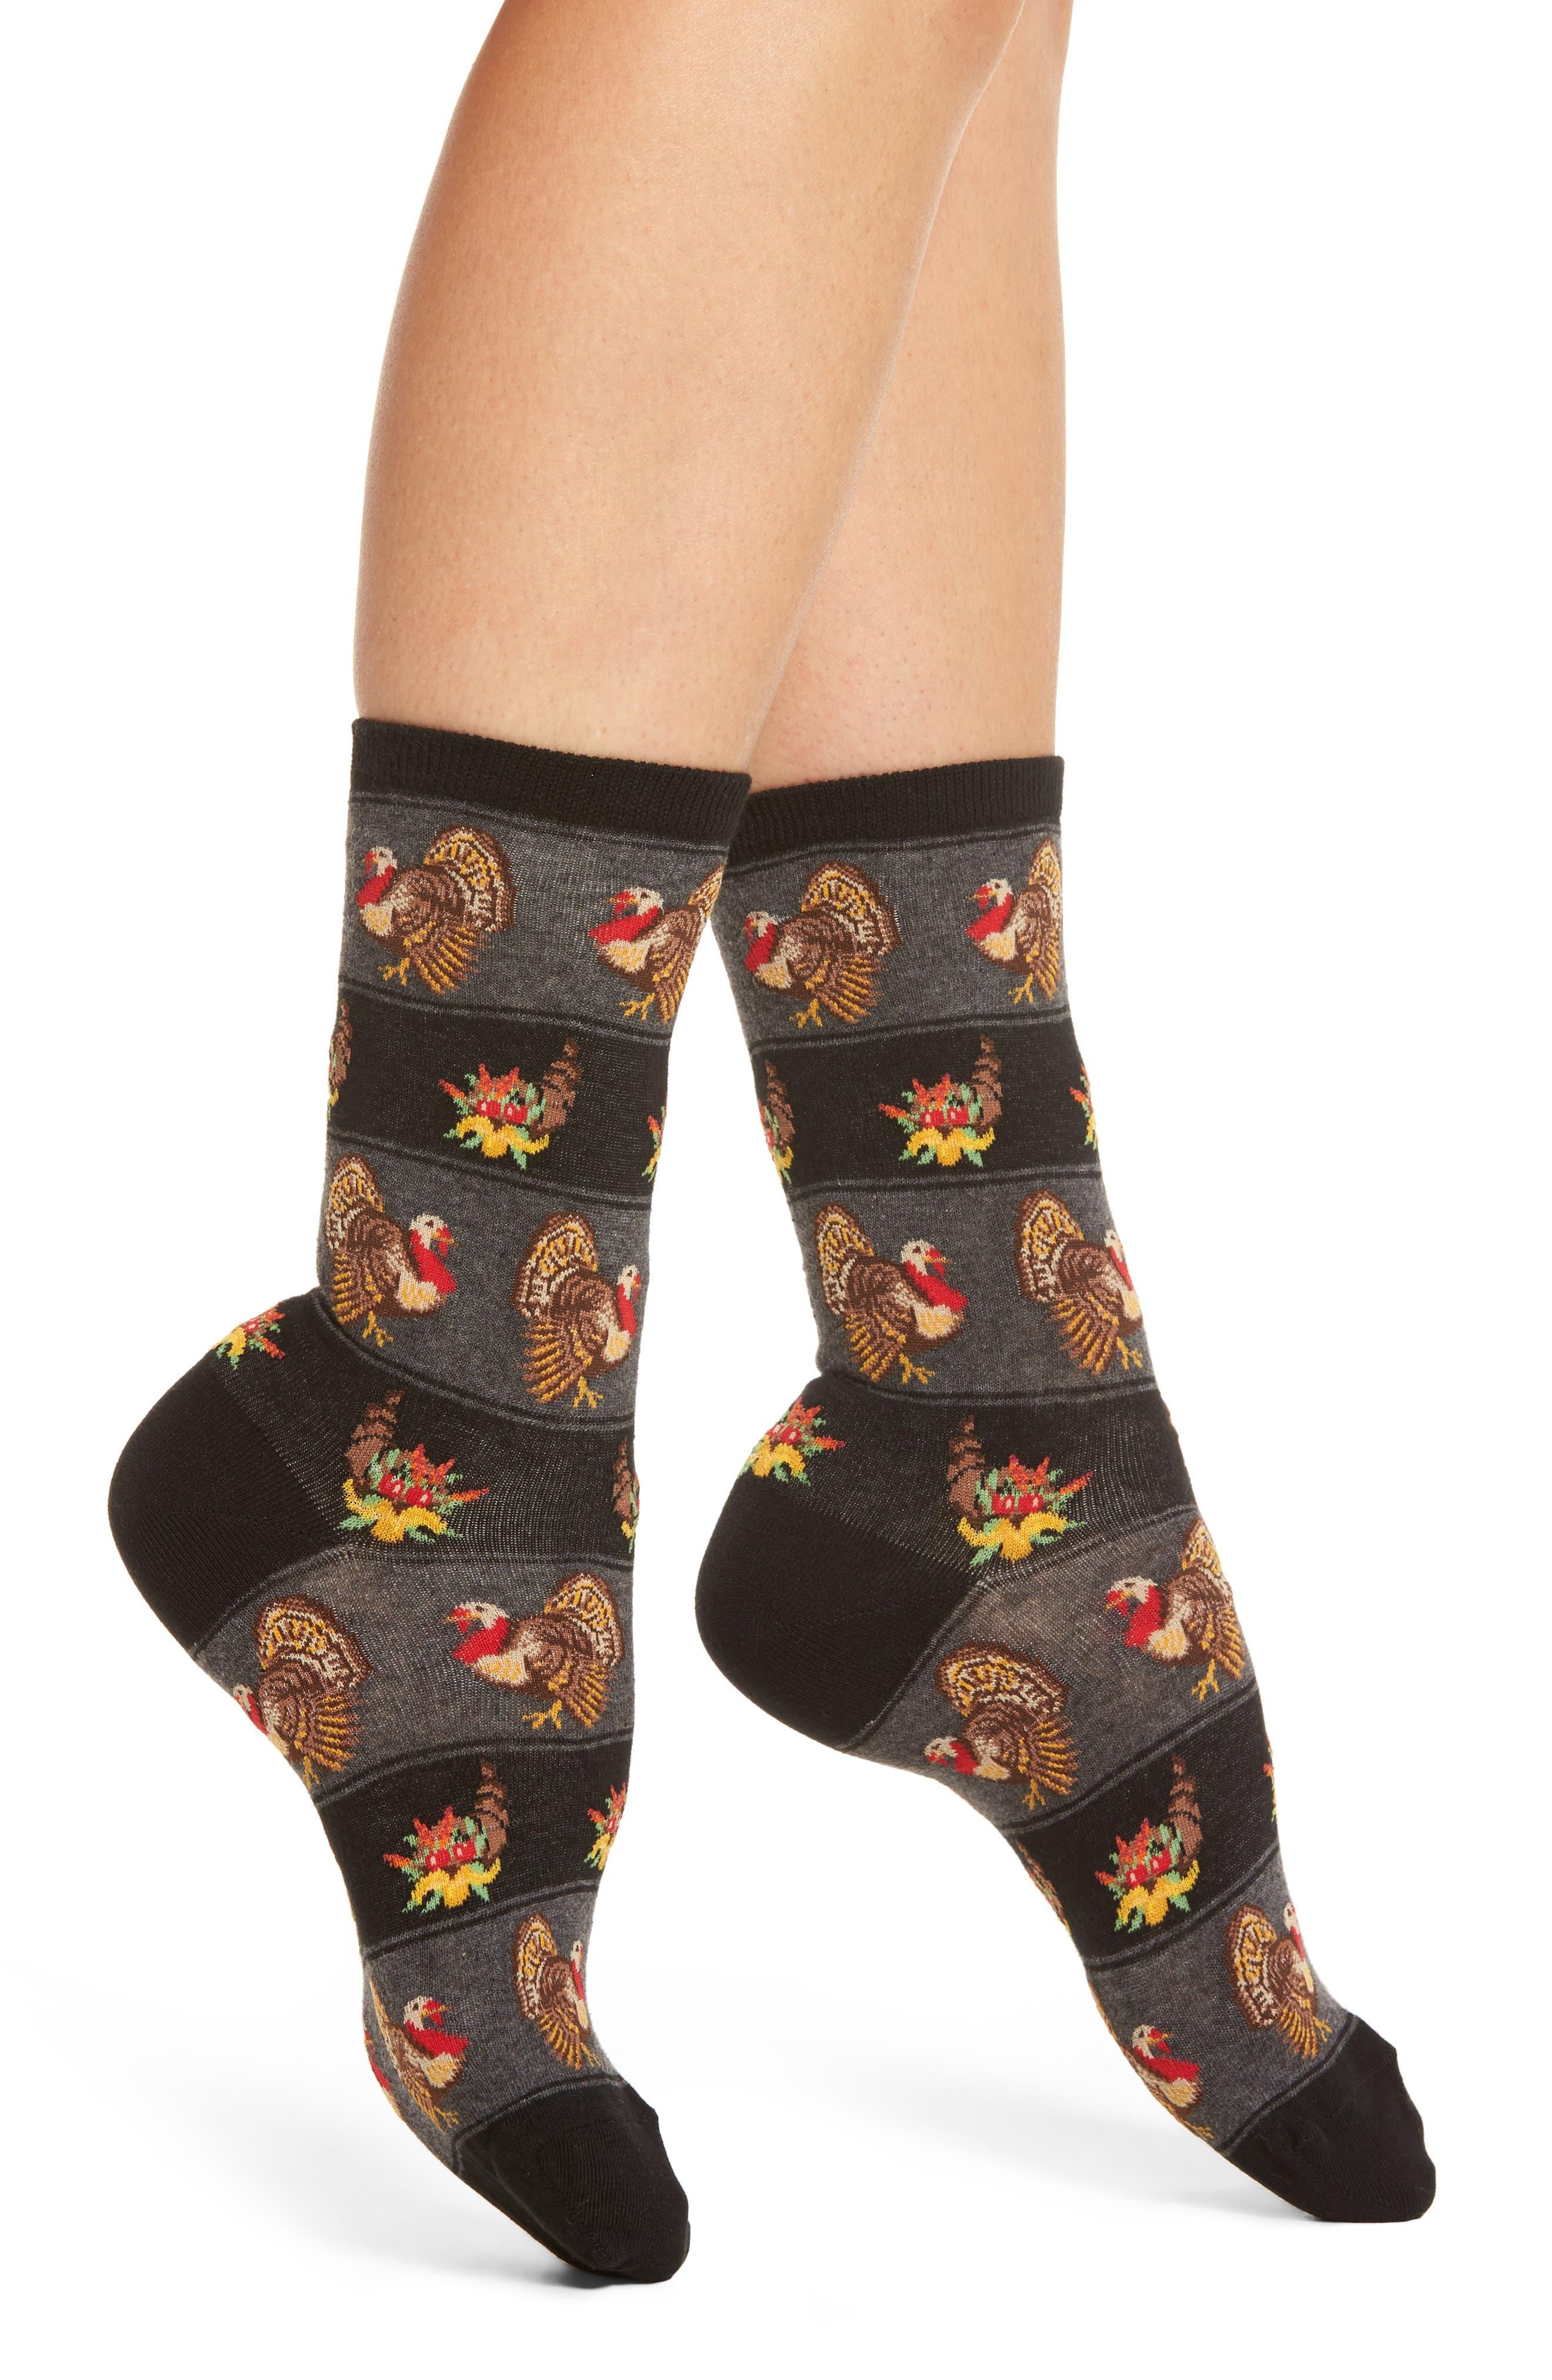 Thanksgiving Crew Socks,                         Main,                         color, 001